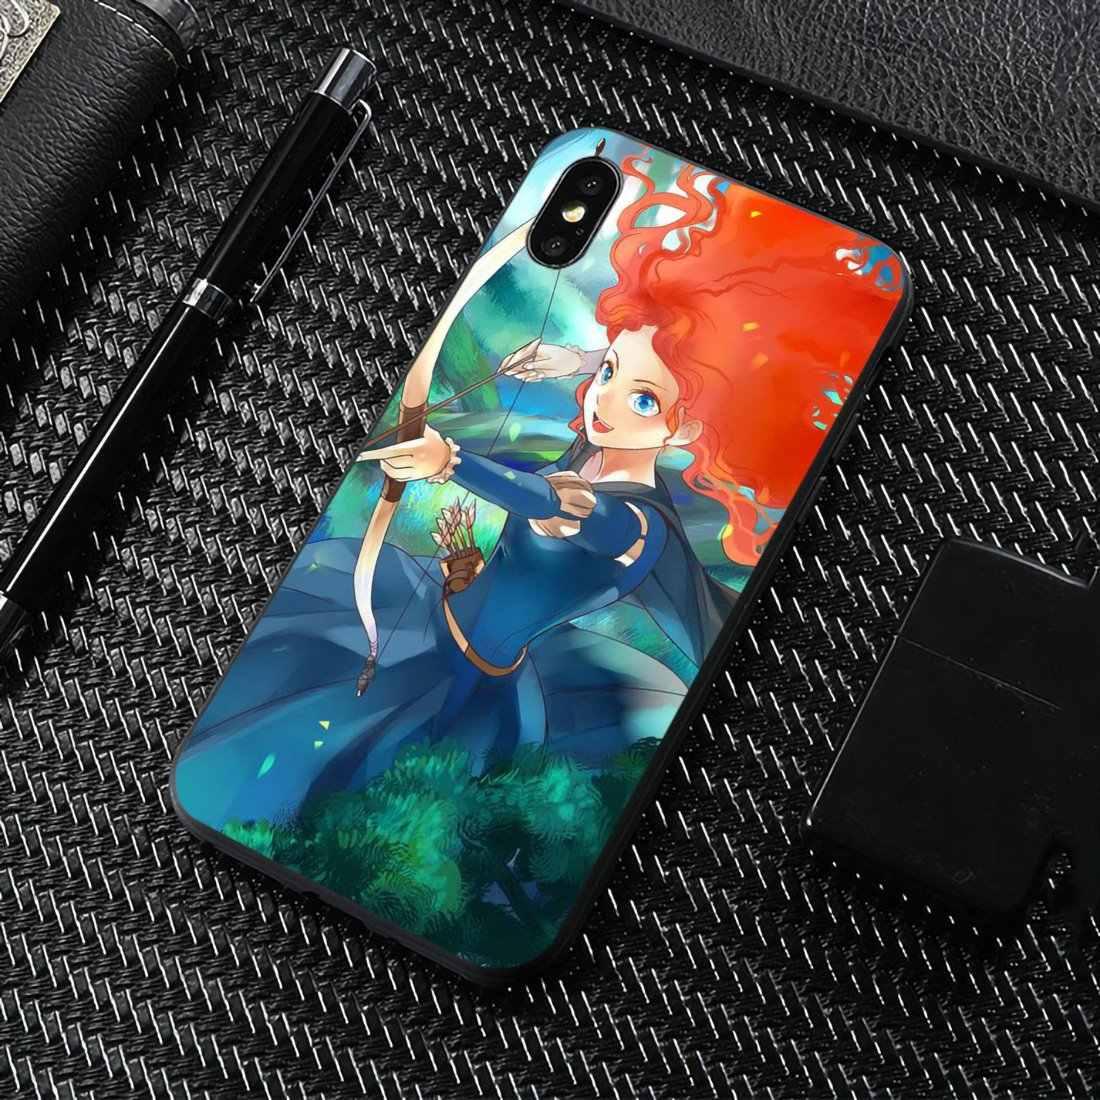 Cartoon Girl Brave Merida Cover For Meizu M6 M5 M6S M5S M2 M3 M3S NOTE MX6 M6t 6 5 Pro Plus U20 Luxury Silicone Phone Case